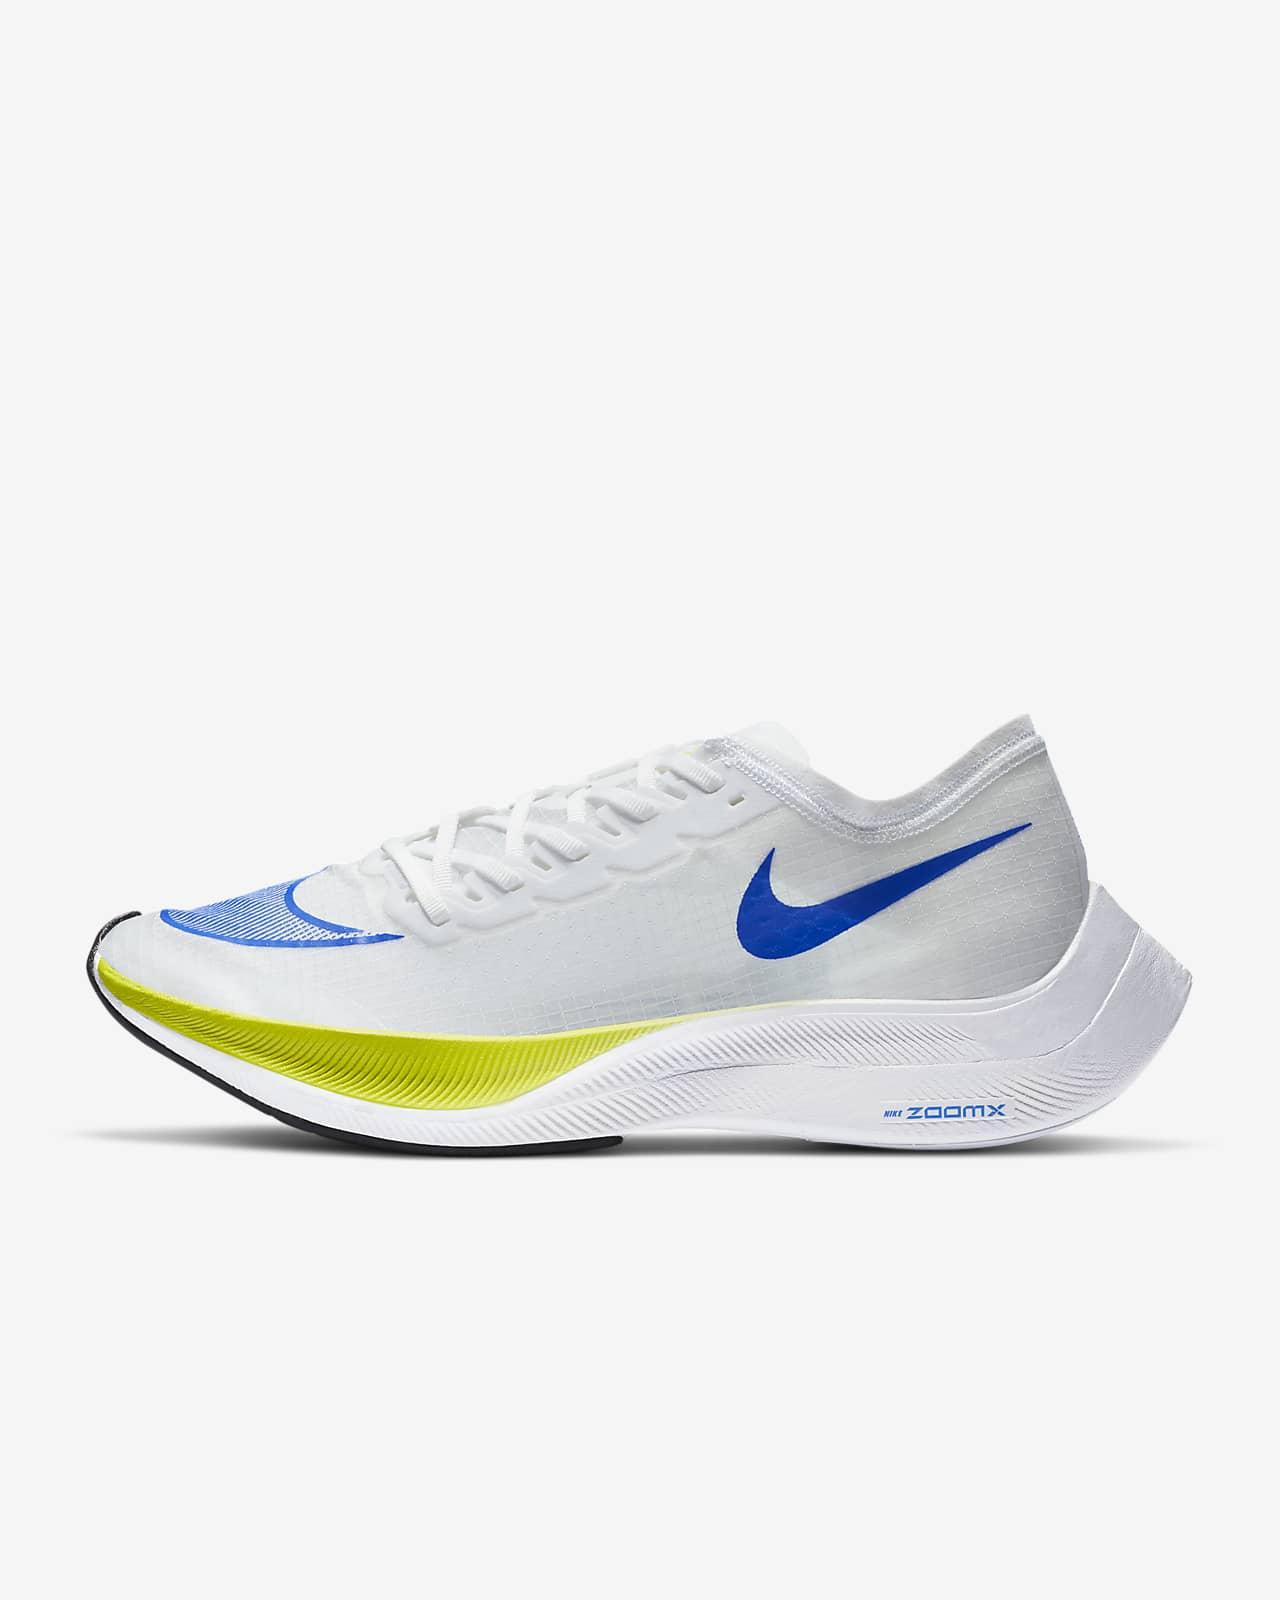 Nike Zoomx Vaporfly Next Running Shoe Nike Id